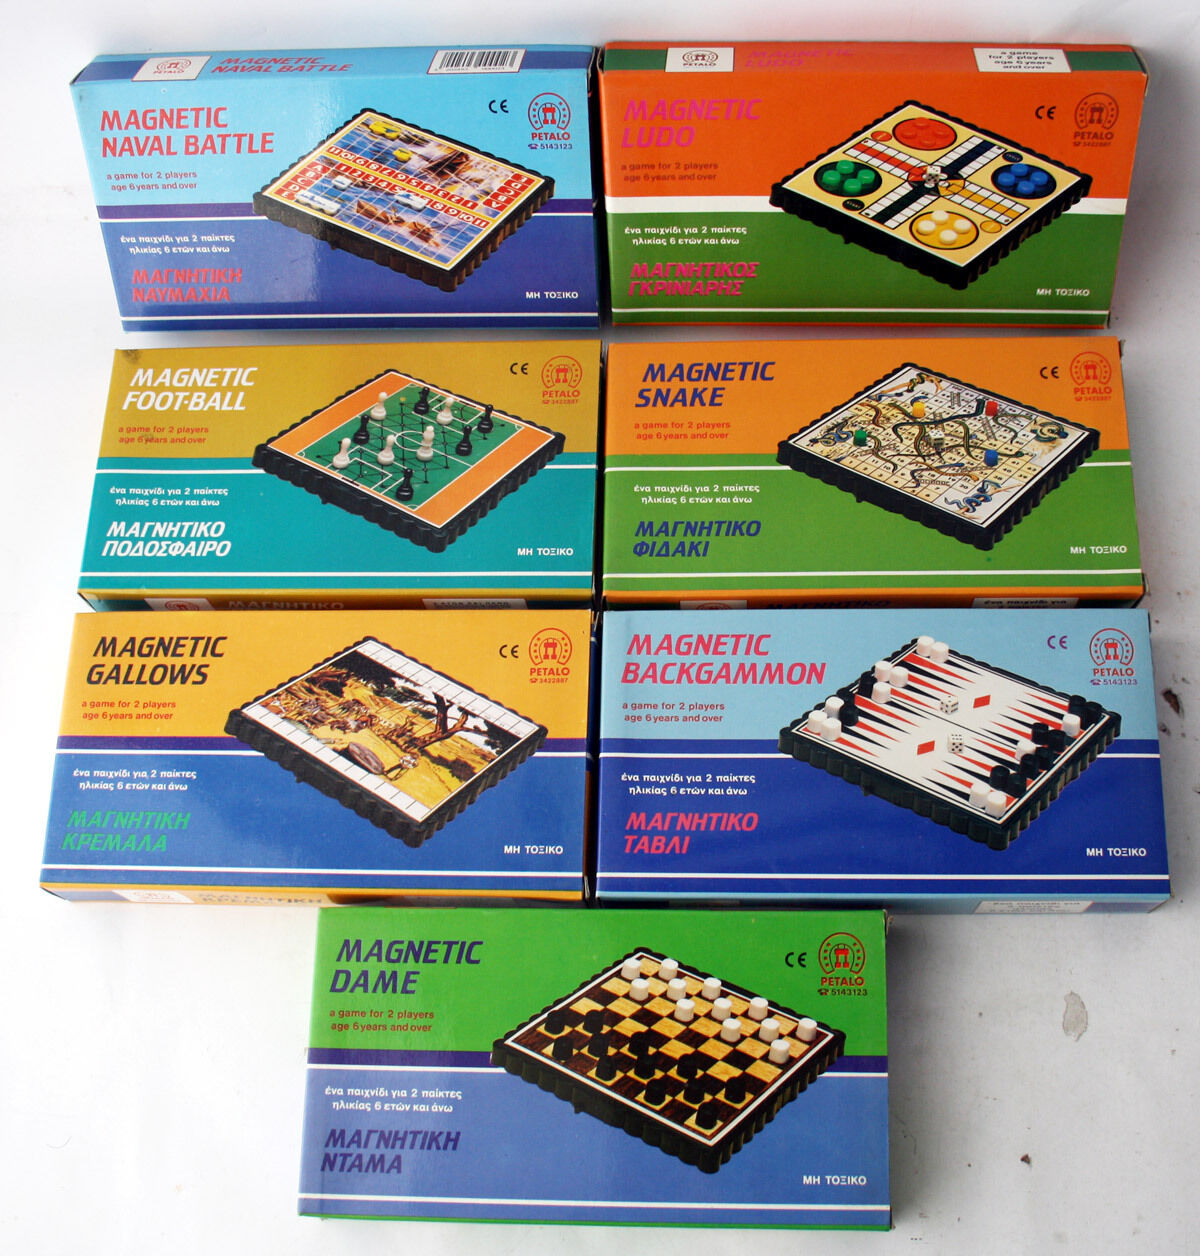 7 X RARE VINTAGE 80'S MAGNETIC GREEK BOARD GAMES BATTLESHIP LUDO PETALO NEW